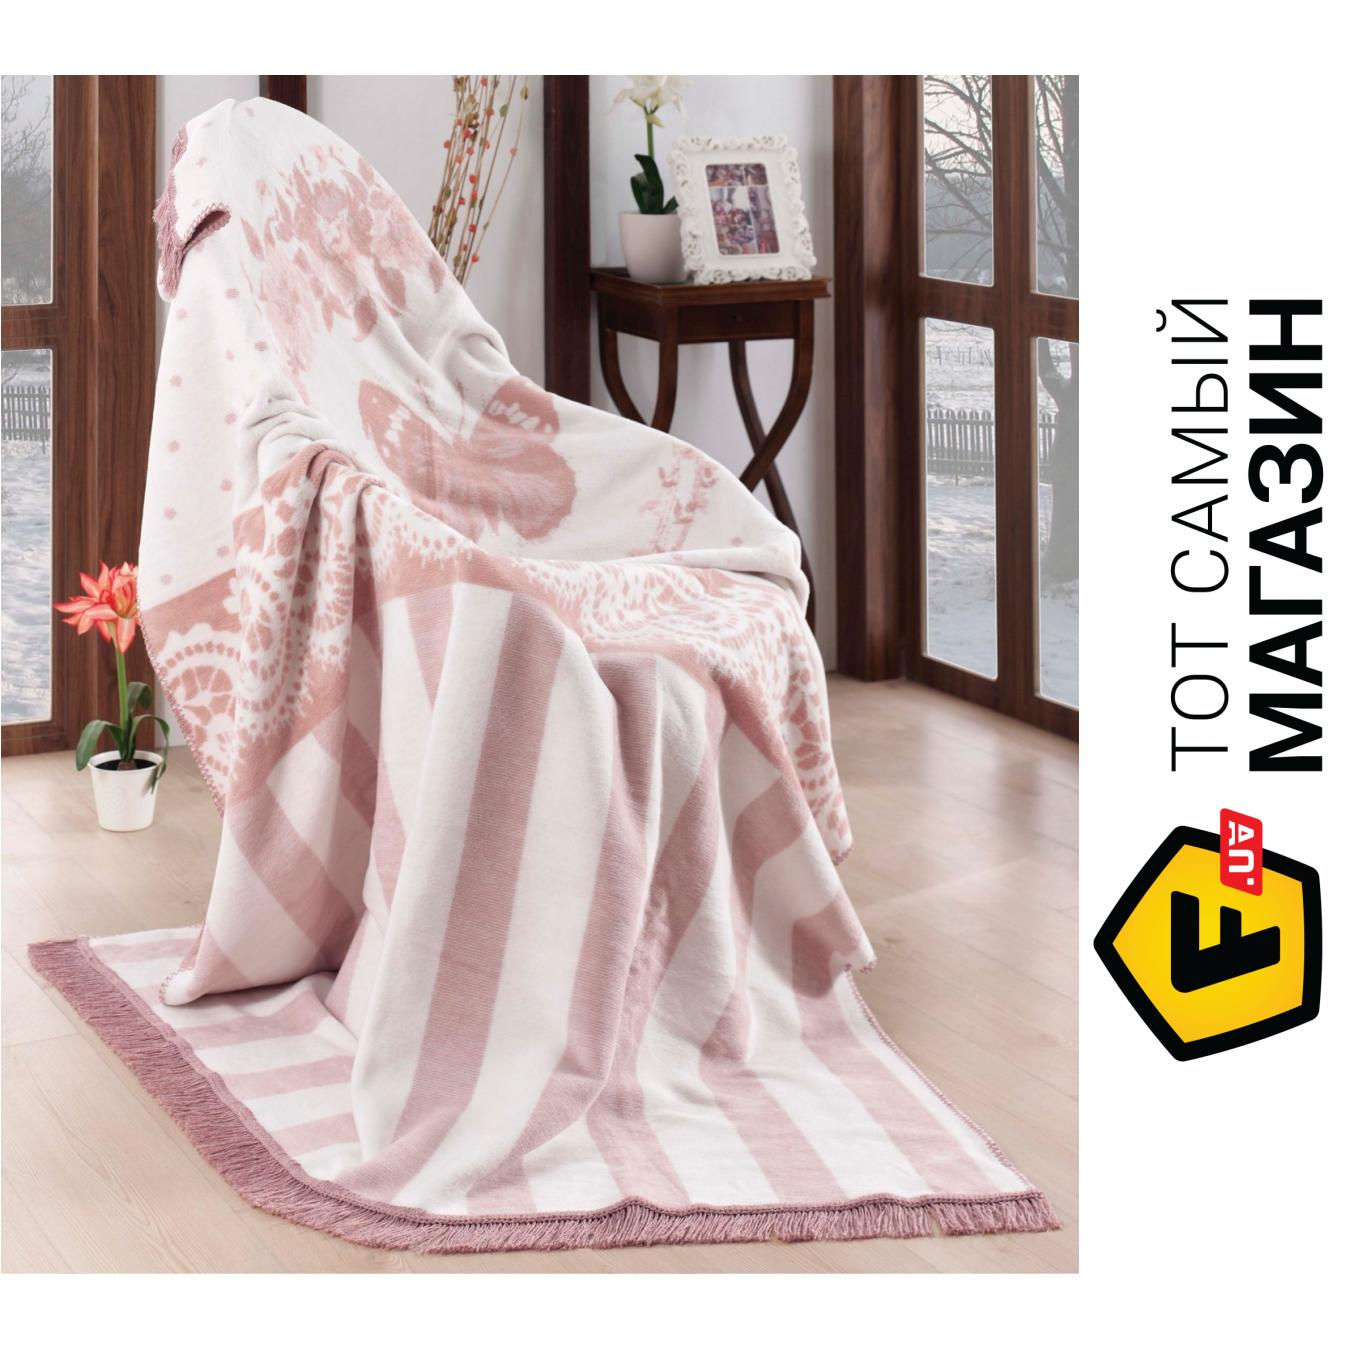 Плед двуспальное 220 x 200 см легкое розовый Arya Molly 200x220см ... f4b762bee485c